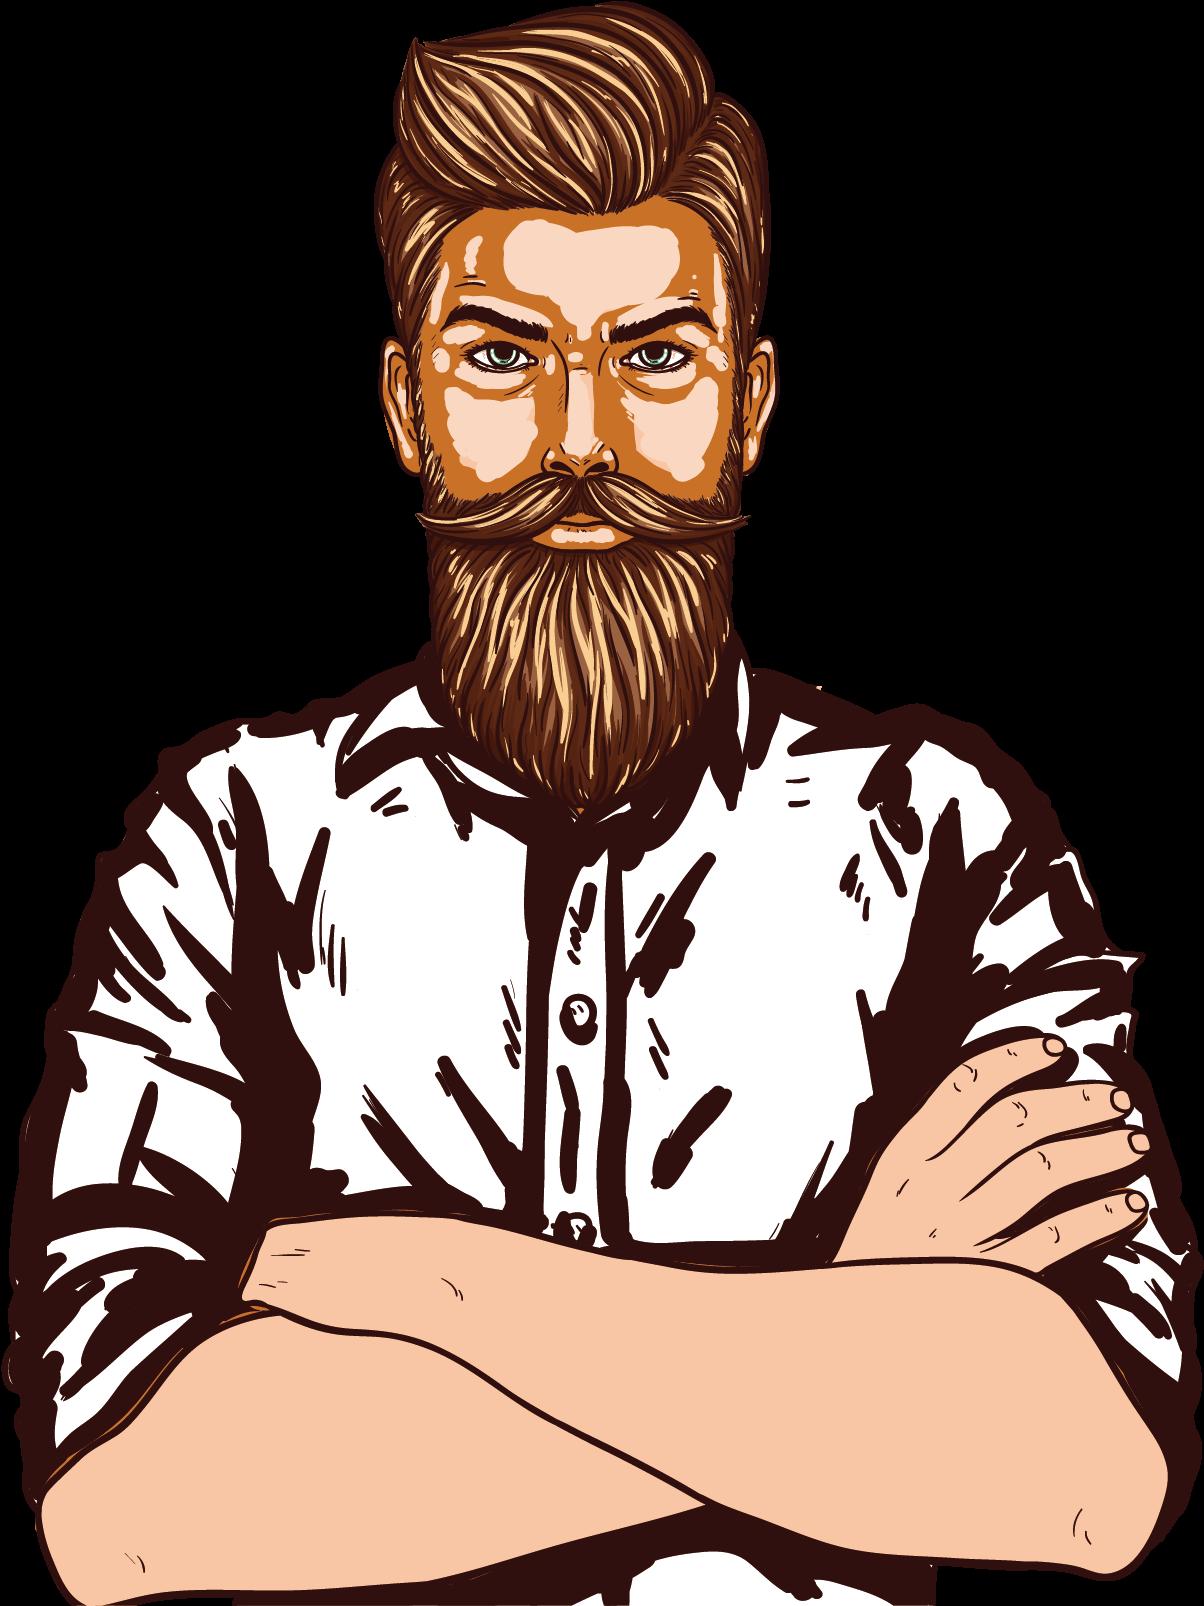 HD Man Page, Man Vector, Beard Man, Clipart Images, Clip.